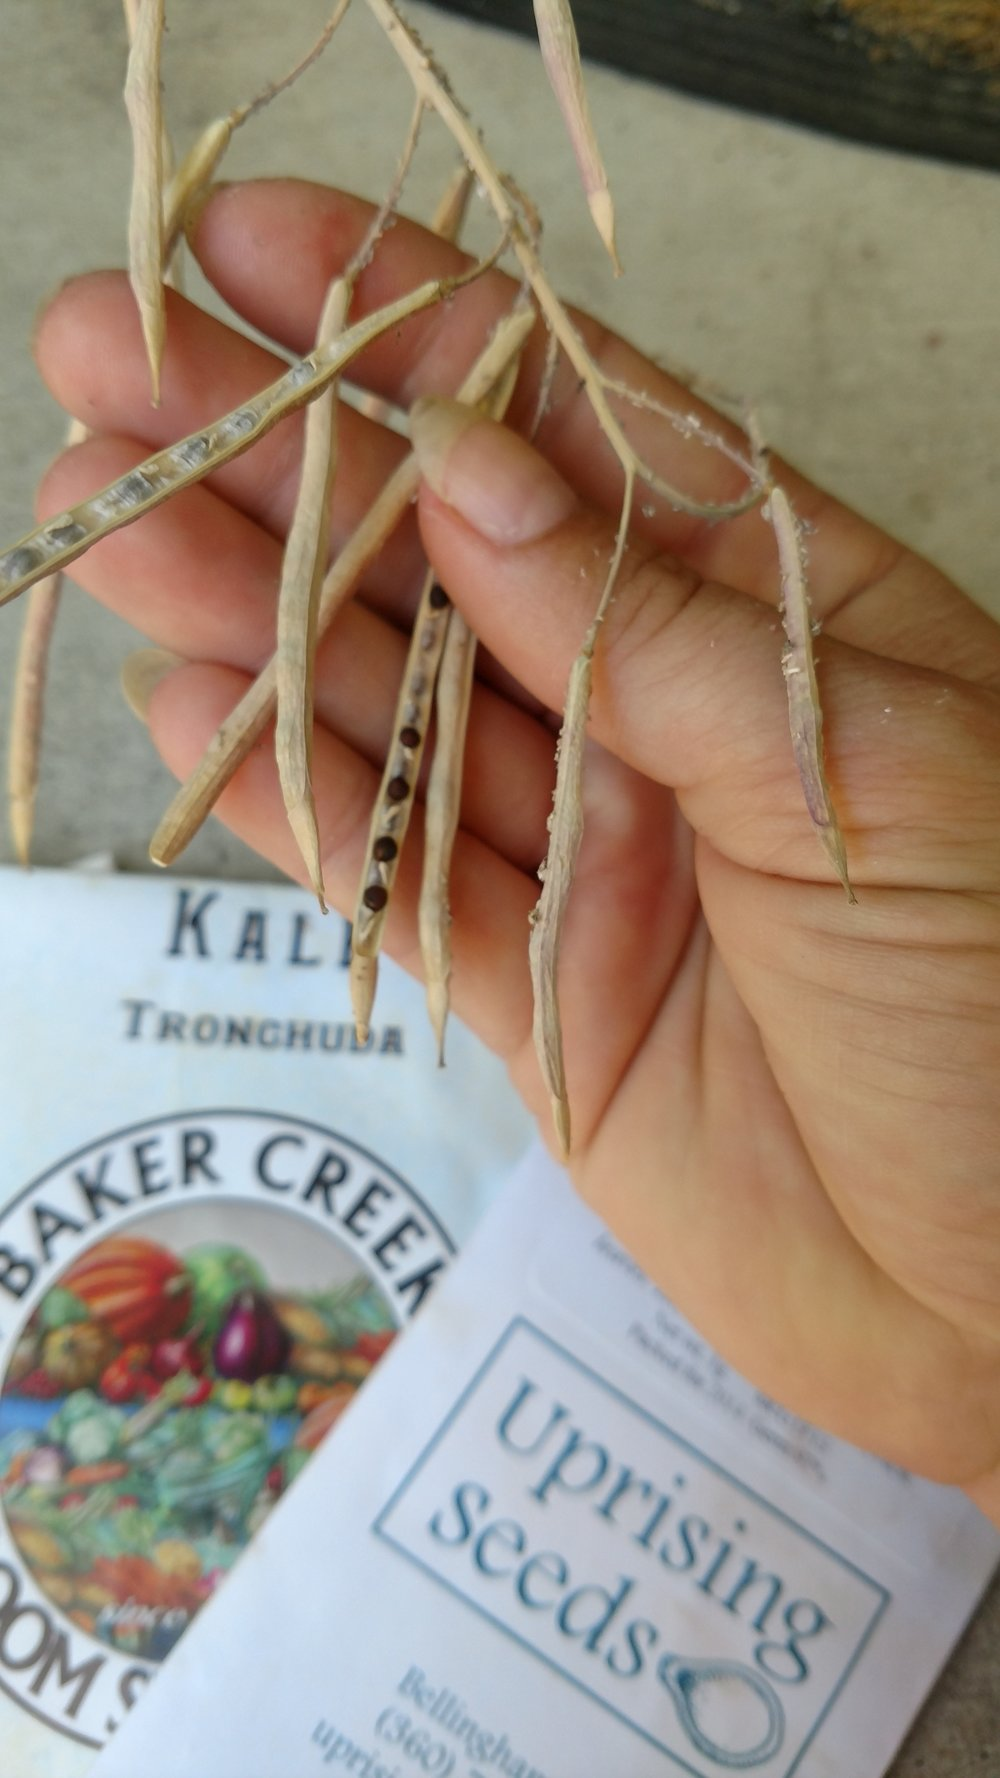 portuguese-kale_seeds_troncha